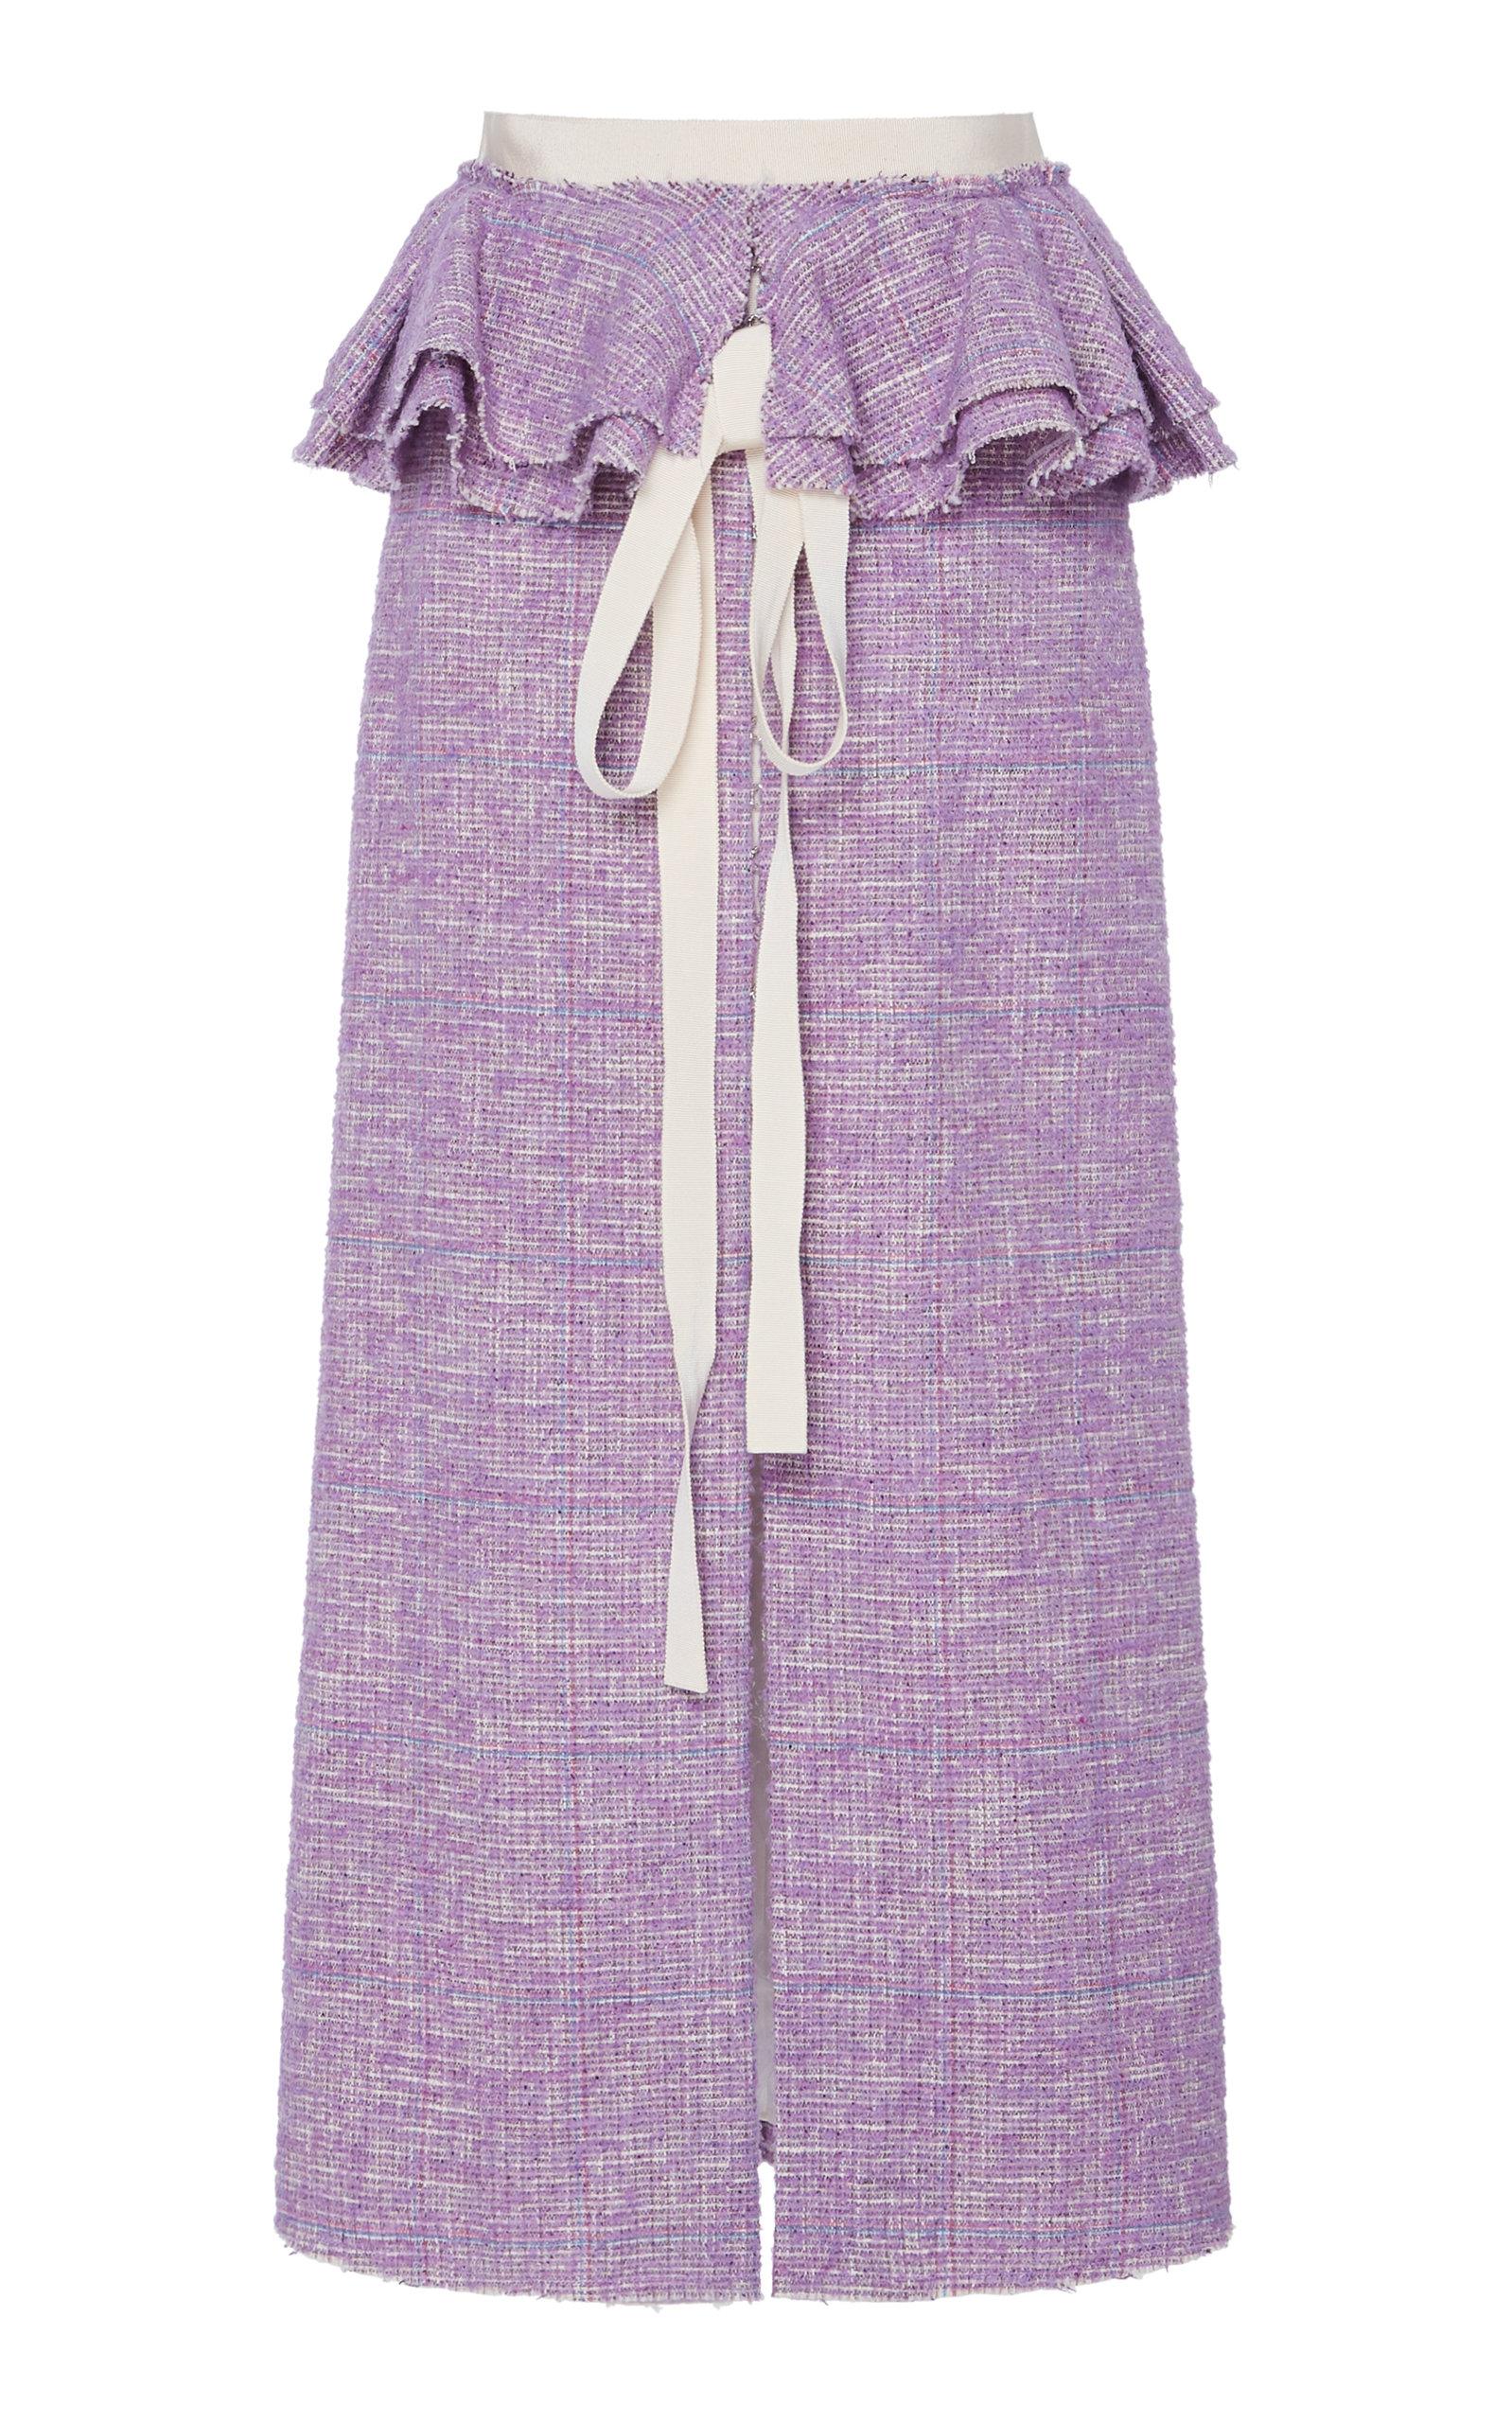 57e2fdc4d0 Perla Ruffle Waist Tweed Skirt by Brock Collection | Moda Operandi